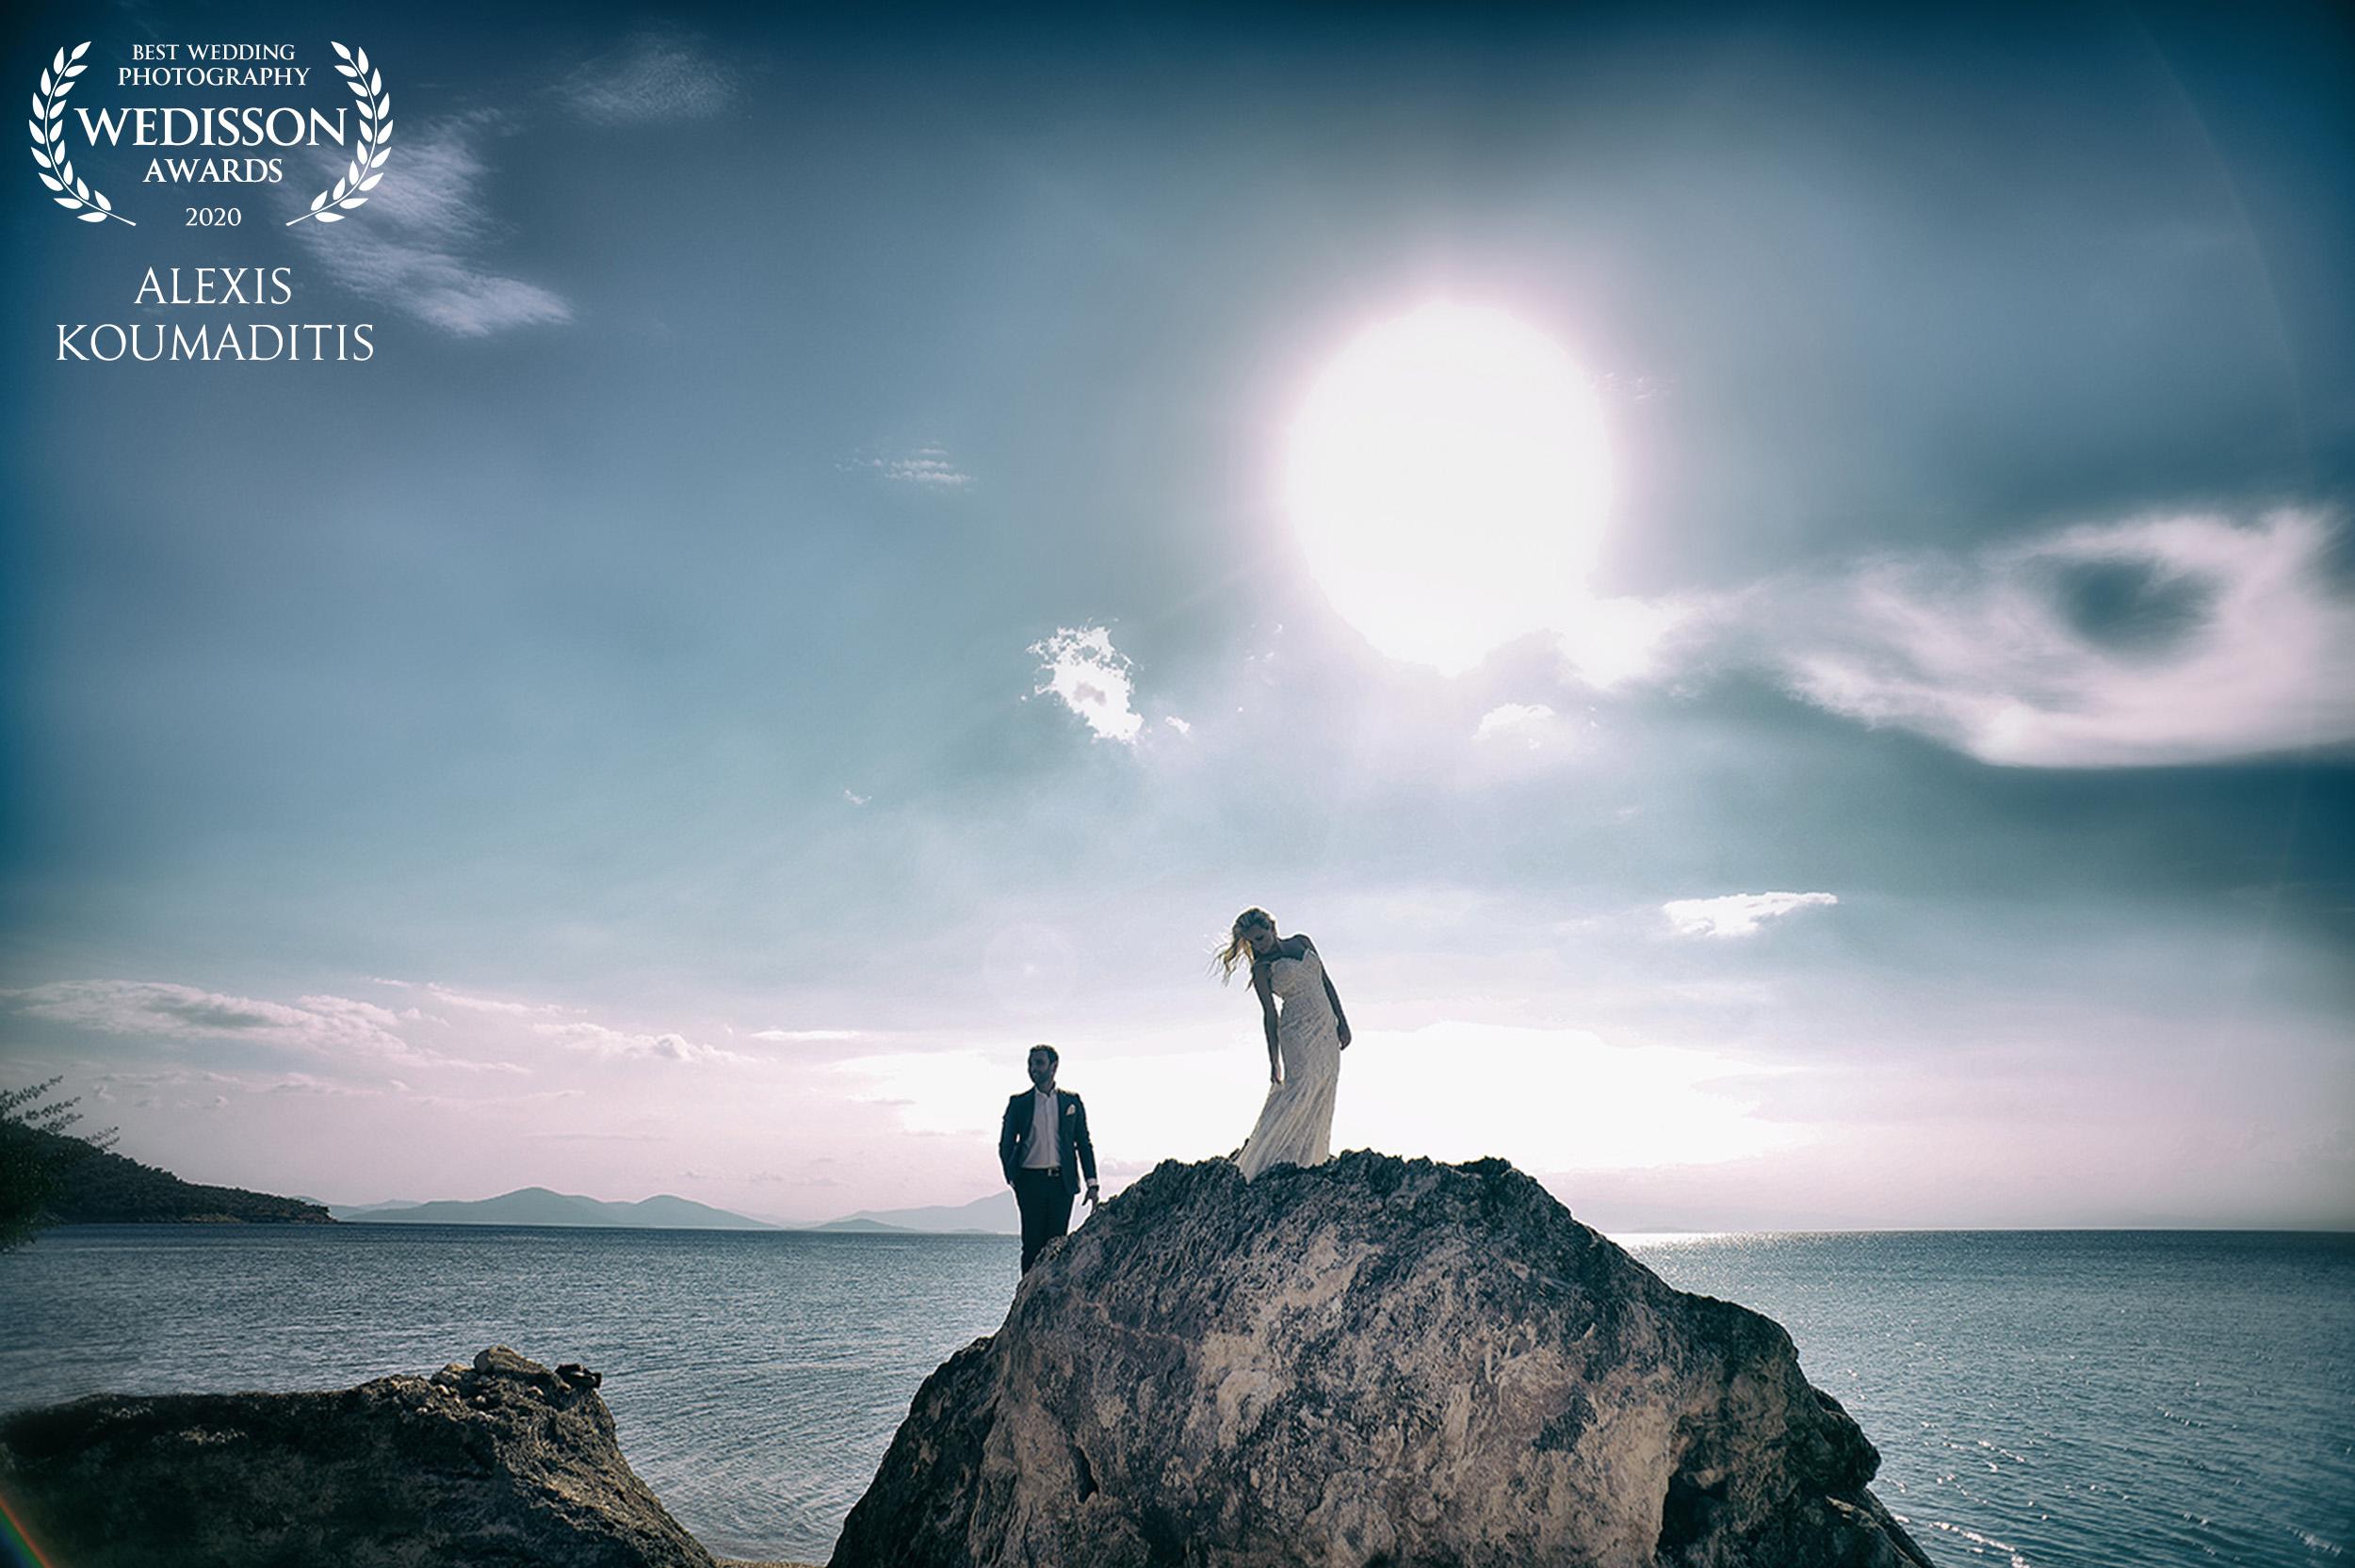 awarded-photo-thessalia-alexis-koumasitis-wedding-photographer-greece